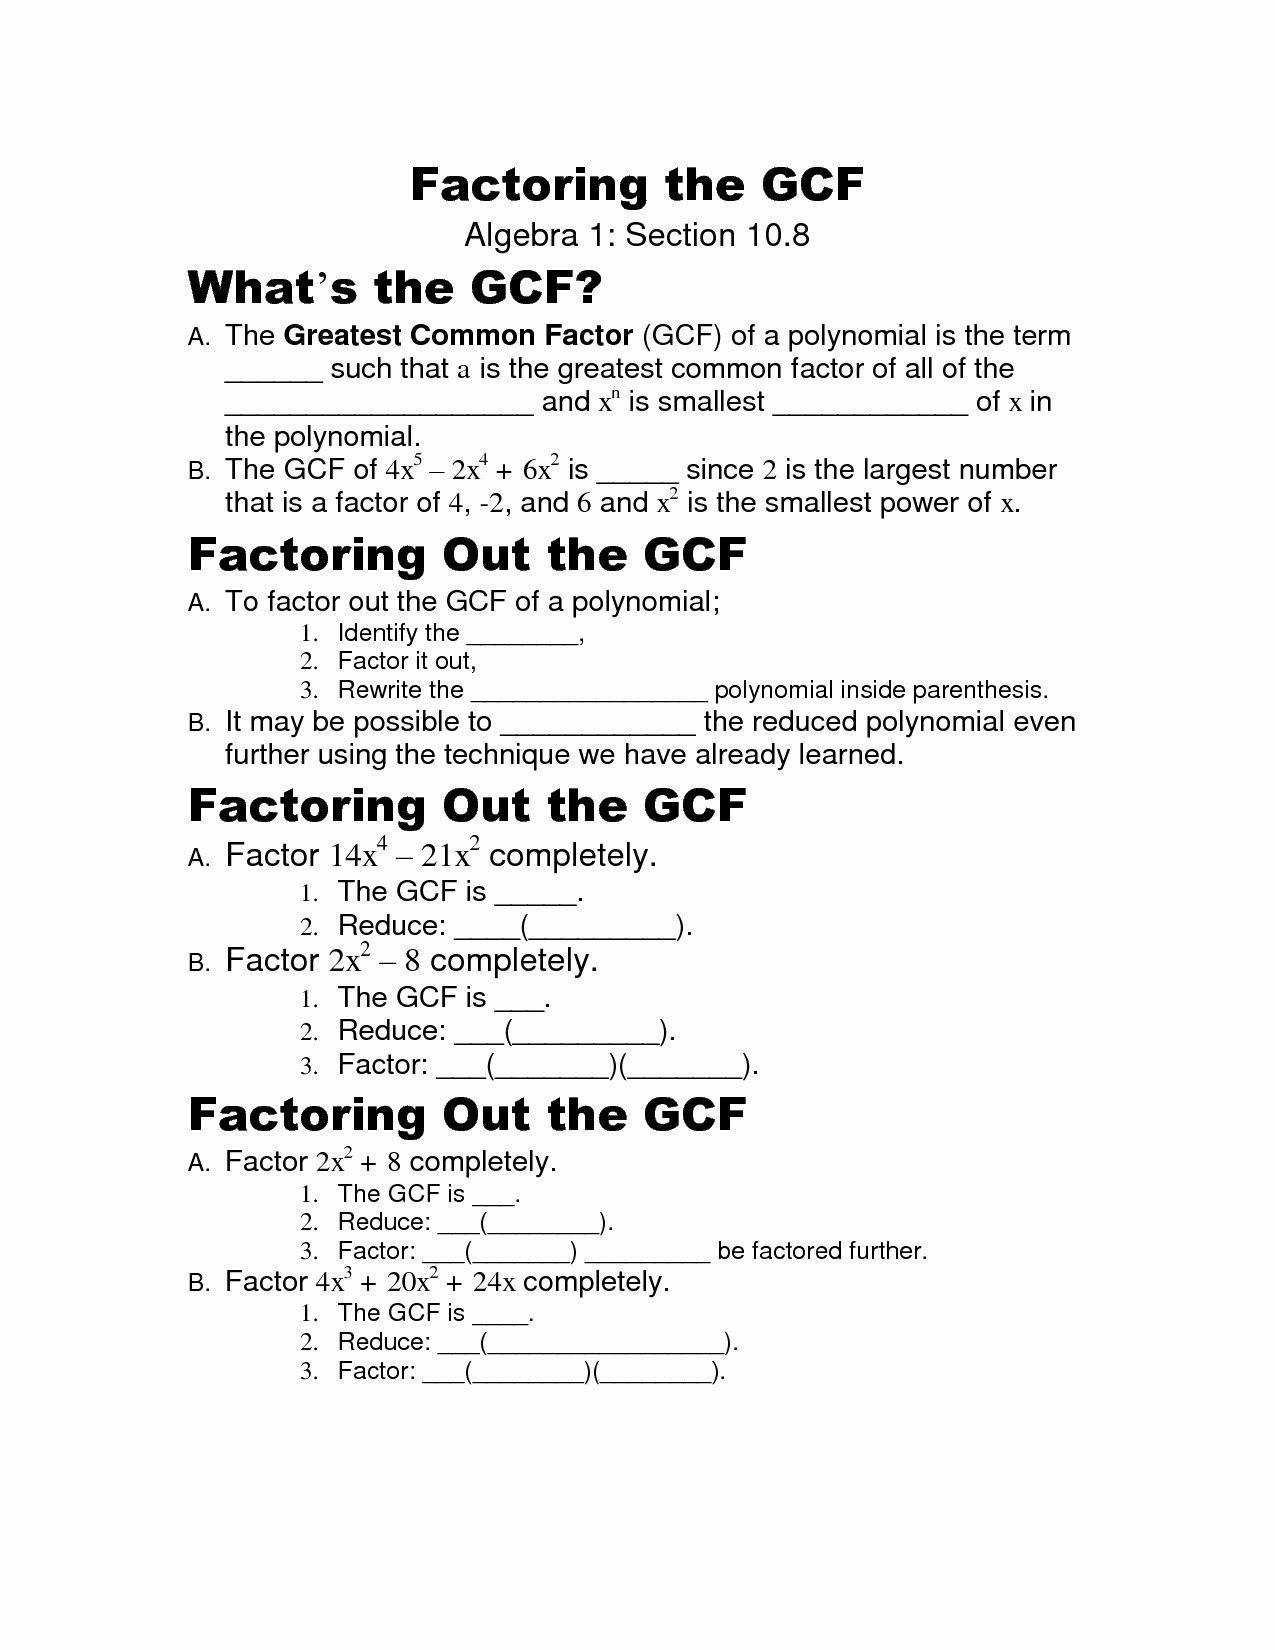 Factoring Greatest Common Factor Worksheet Luxury 16 Best